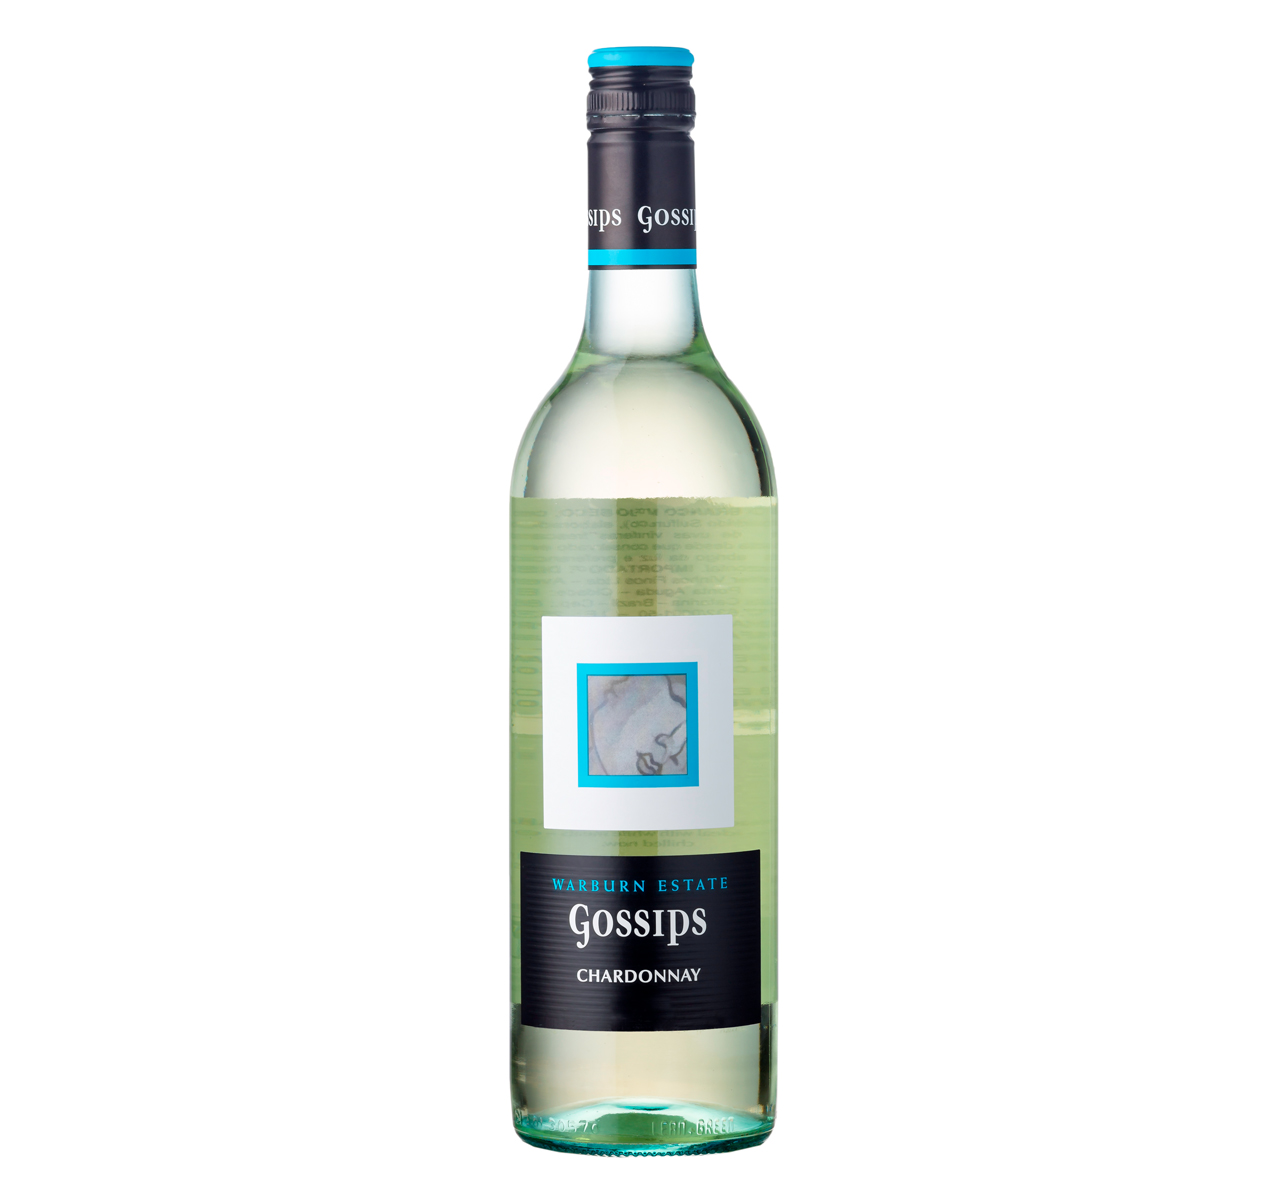 Gossips Chardonnay